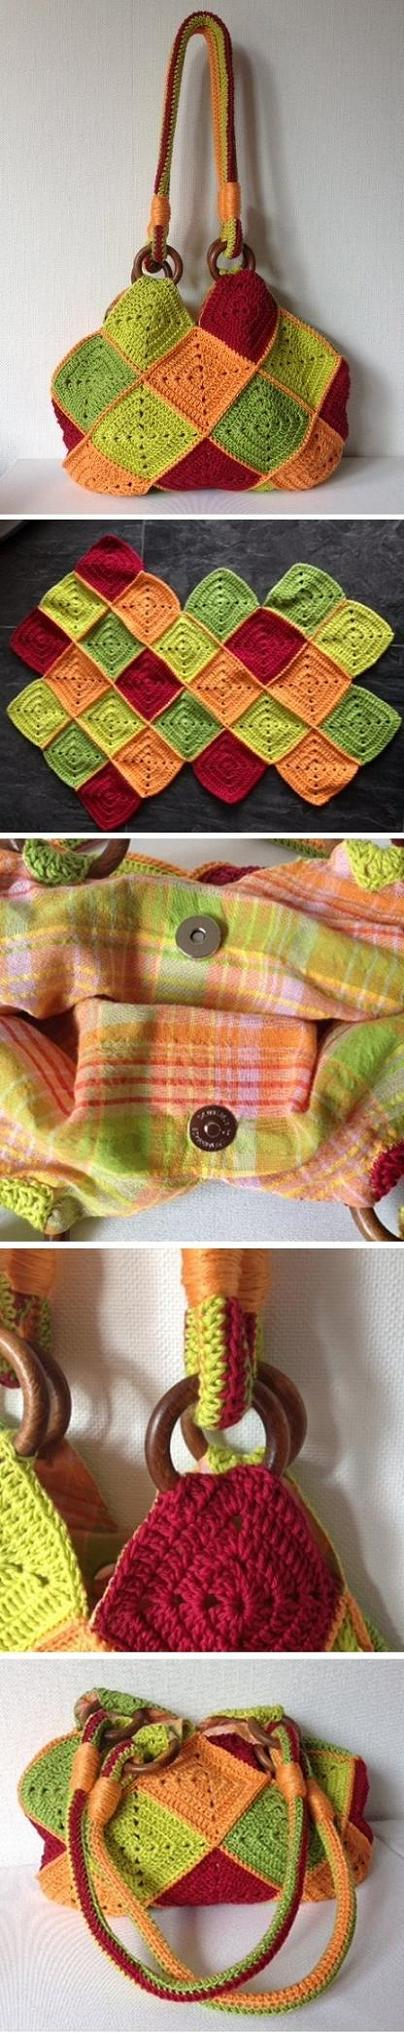 crochet-bag-ideas